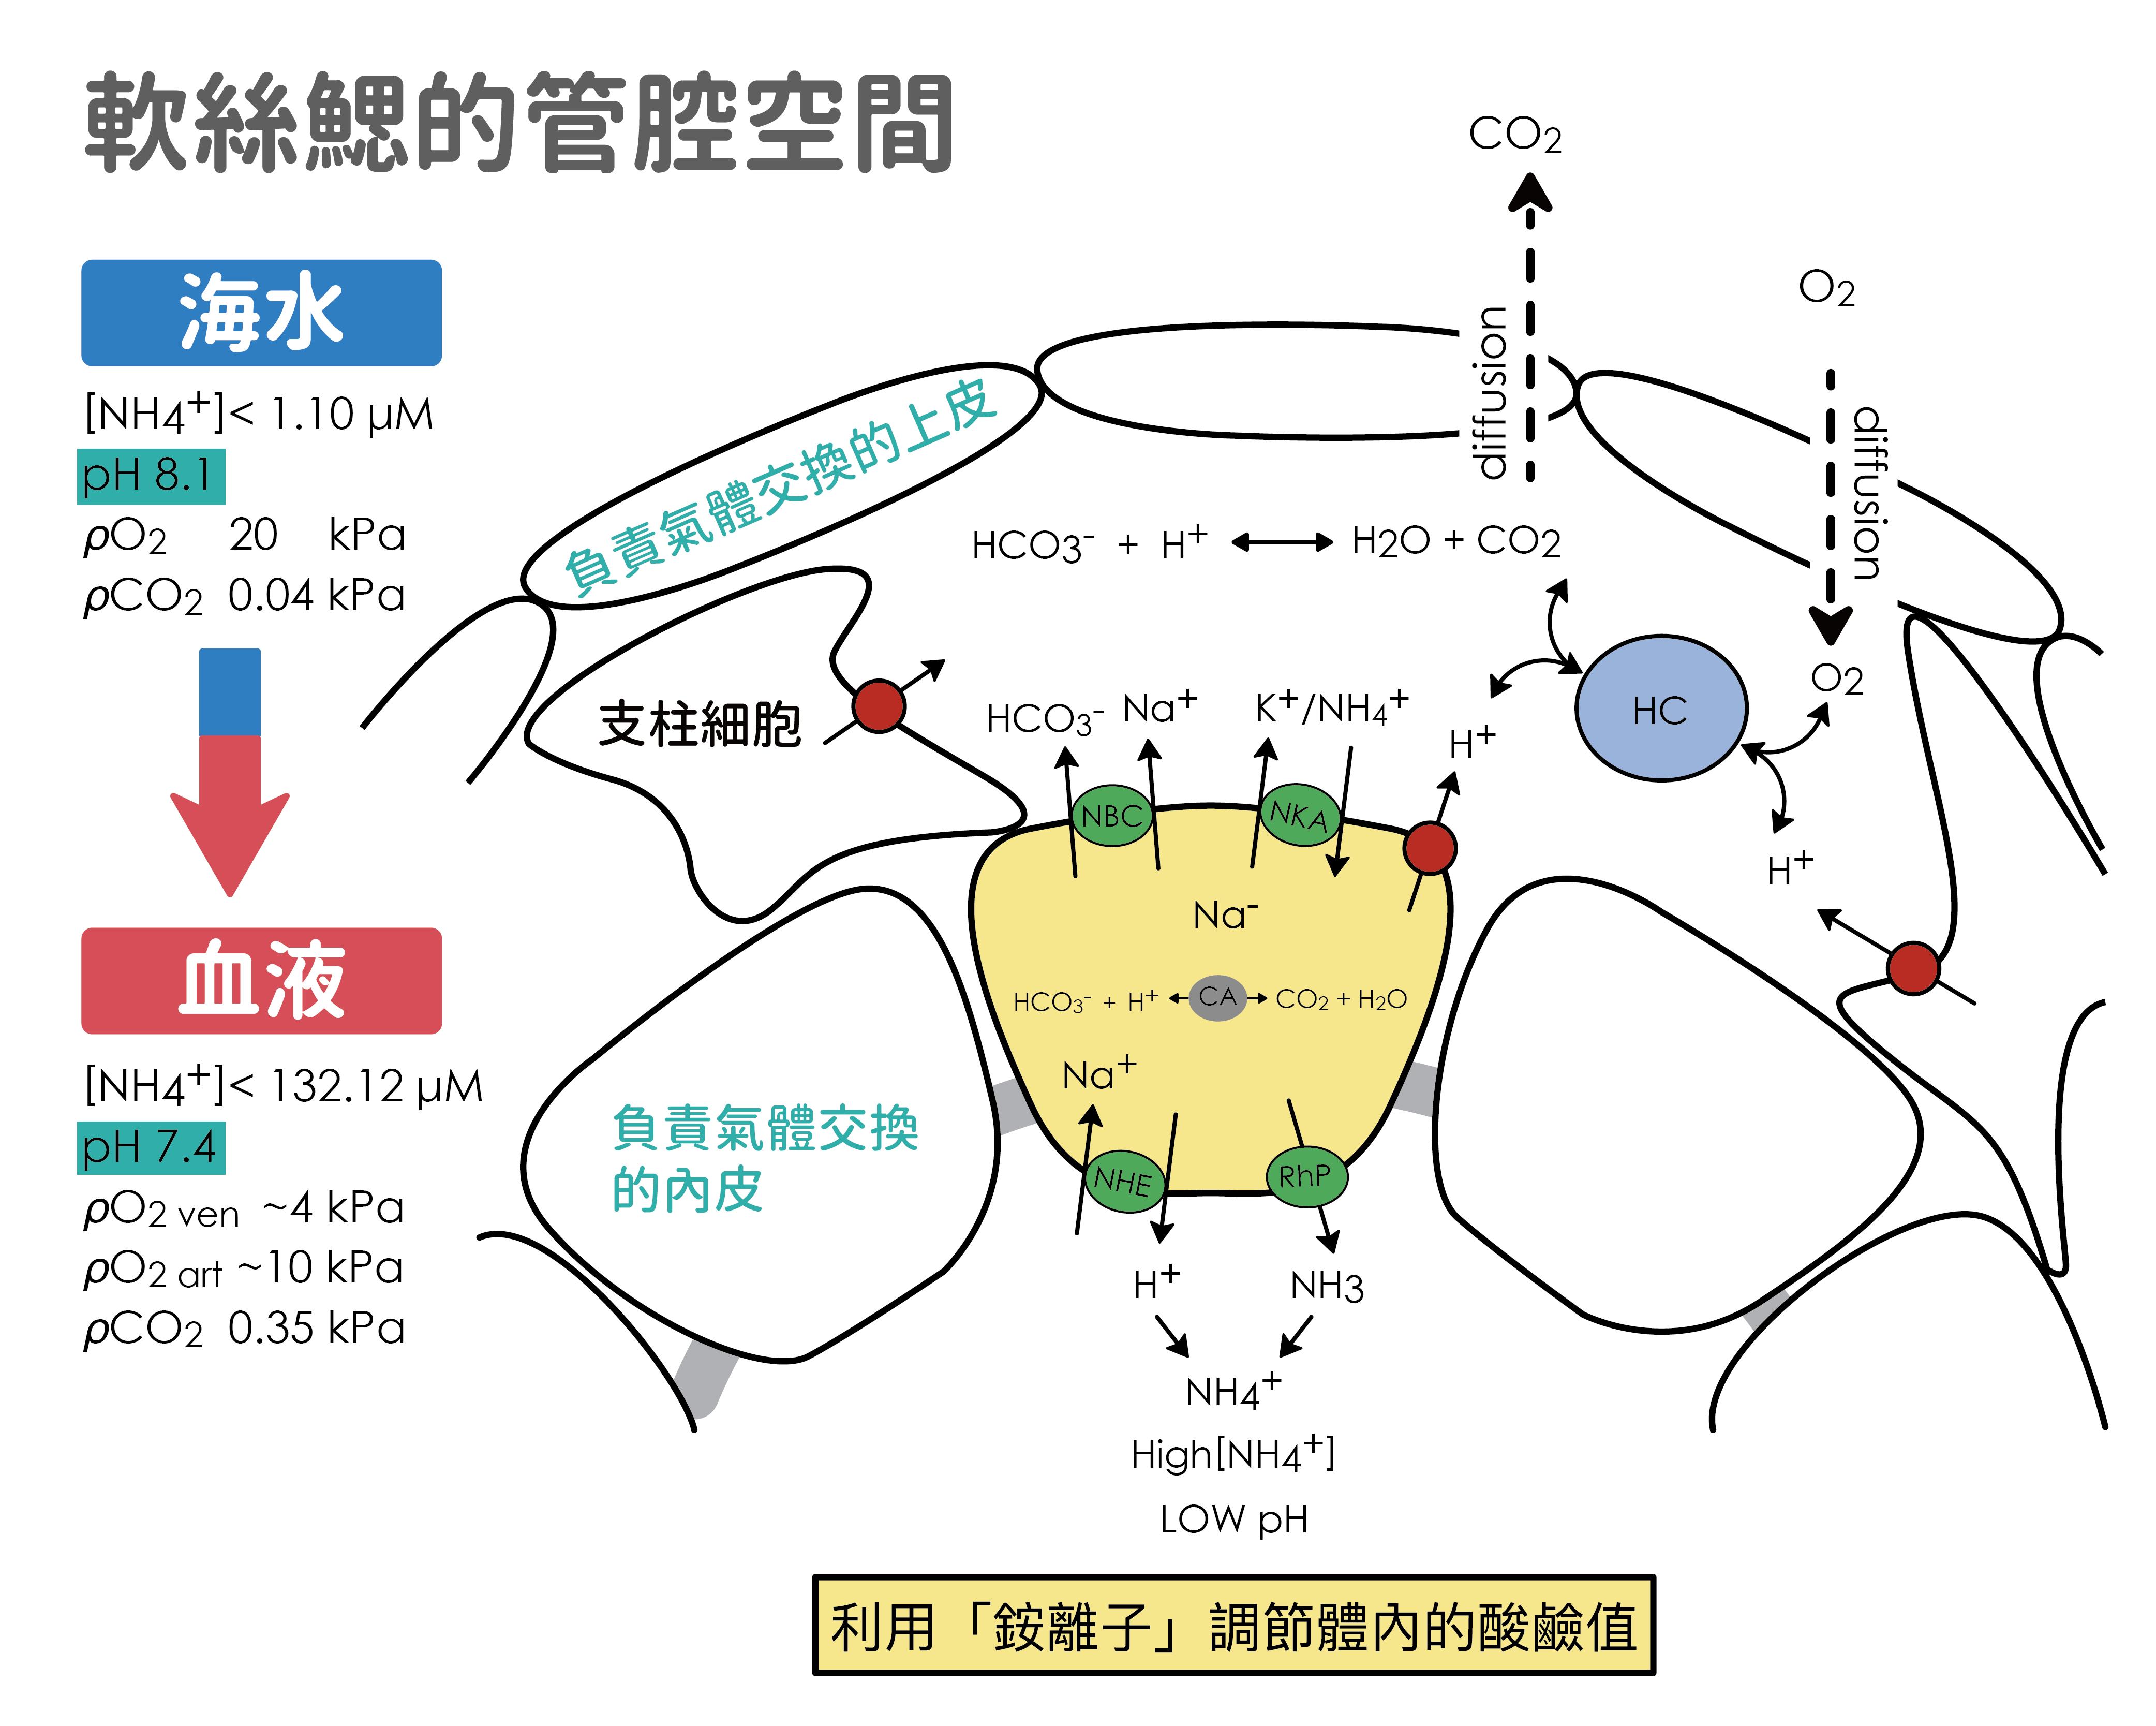 在 pH 8.1 的海水中,軟絲在鰓管腔進行銨離子調控,讓體內血液維持在 pH 7.4 。圖│研之有物 (資料來源│Branchial NH4+-dependent acid–base transport mechanisms and energy metabolism of squid (Sepioteuthis lessoniana) affected by seawater acidification)